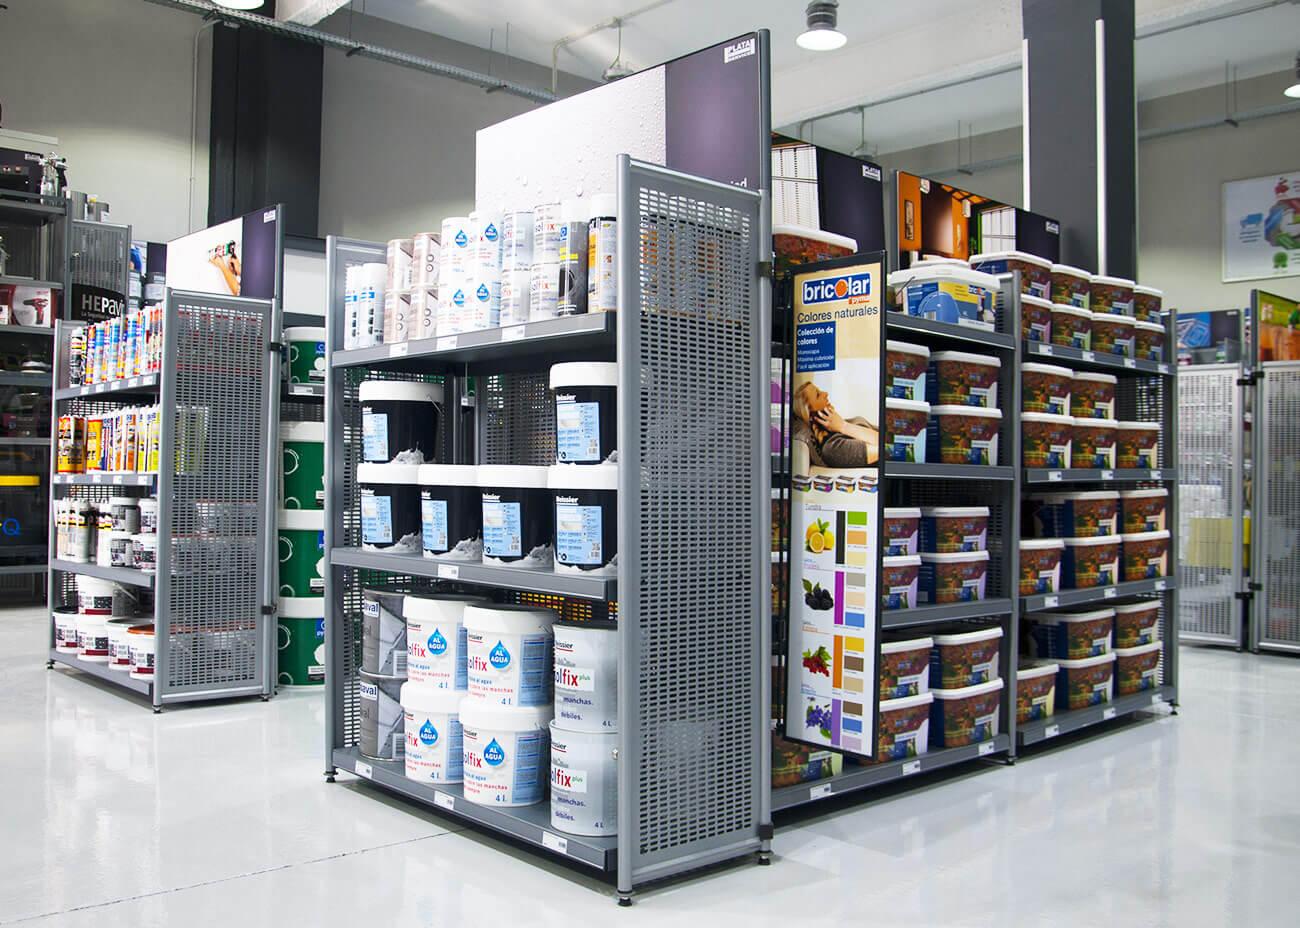 plata-service-img03-caad-retail-design-barcelona